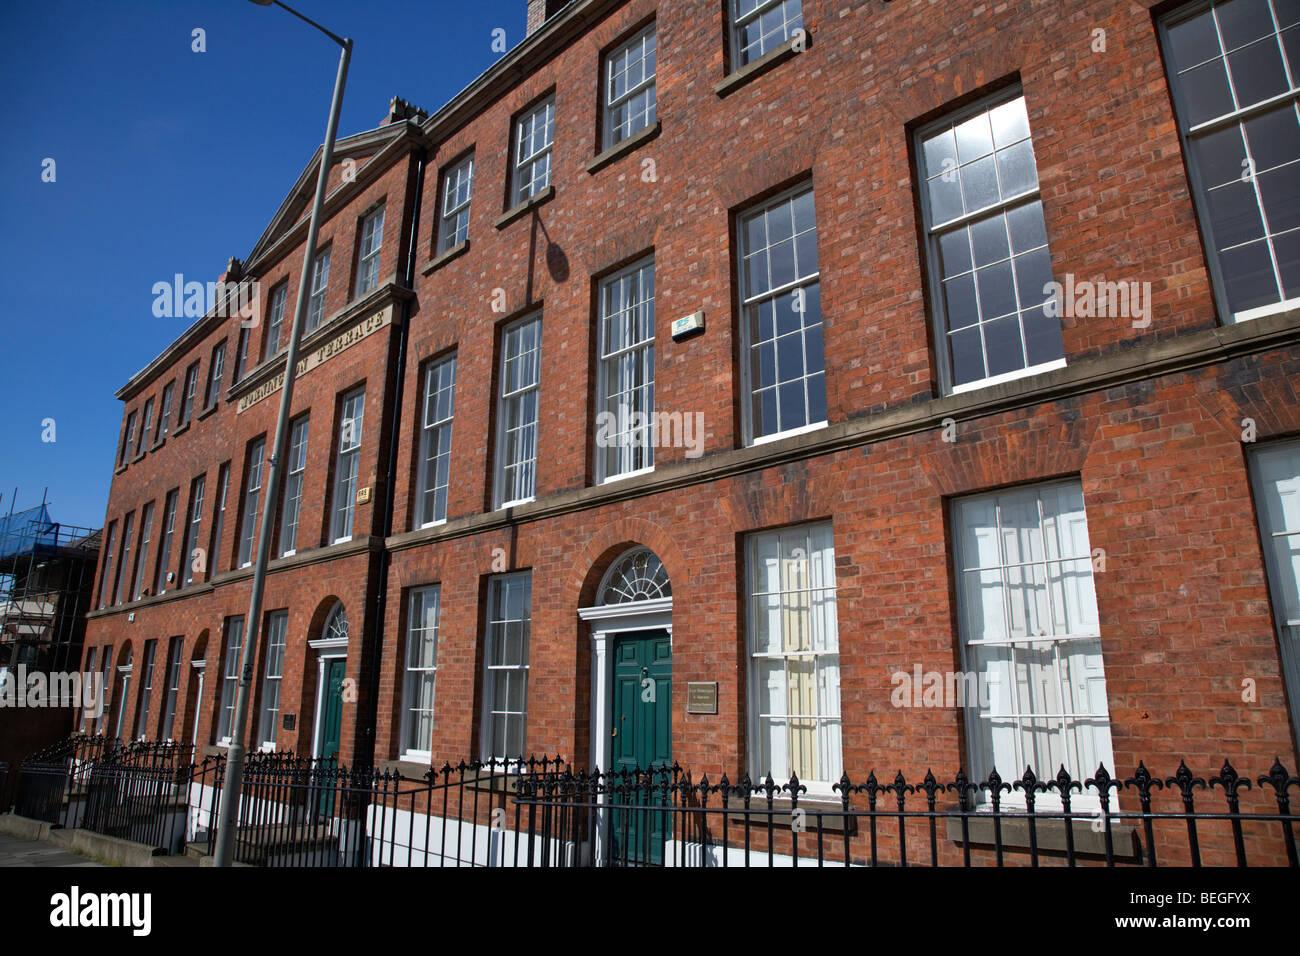 mornington terrace grade II 2 listed georgian terraced building in Upper Duke Street Liverpool Merseyside england - Stock Image